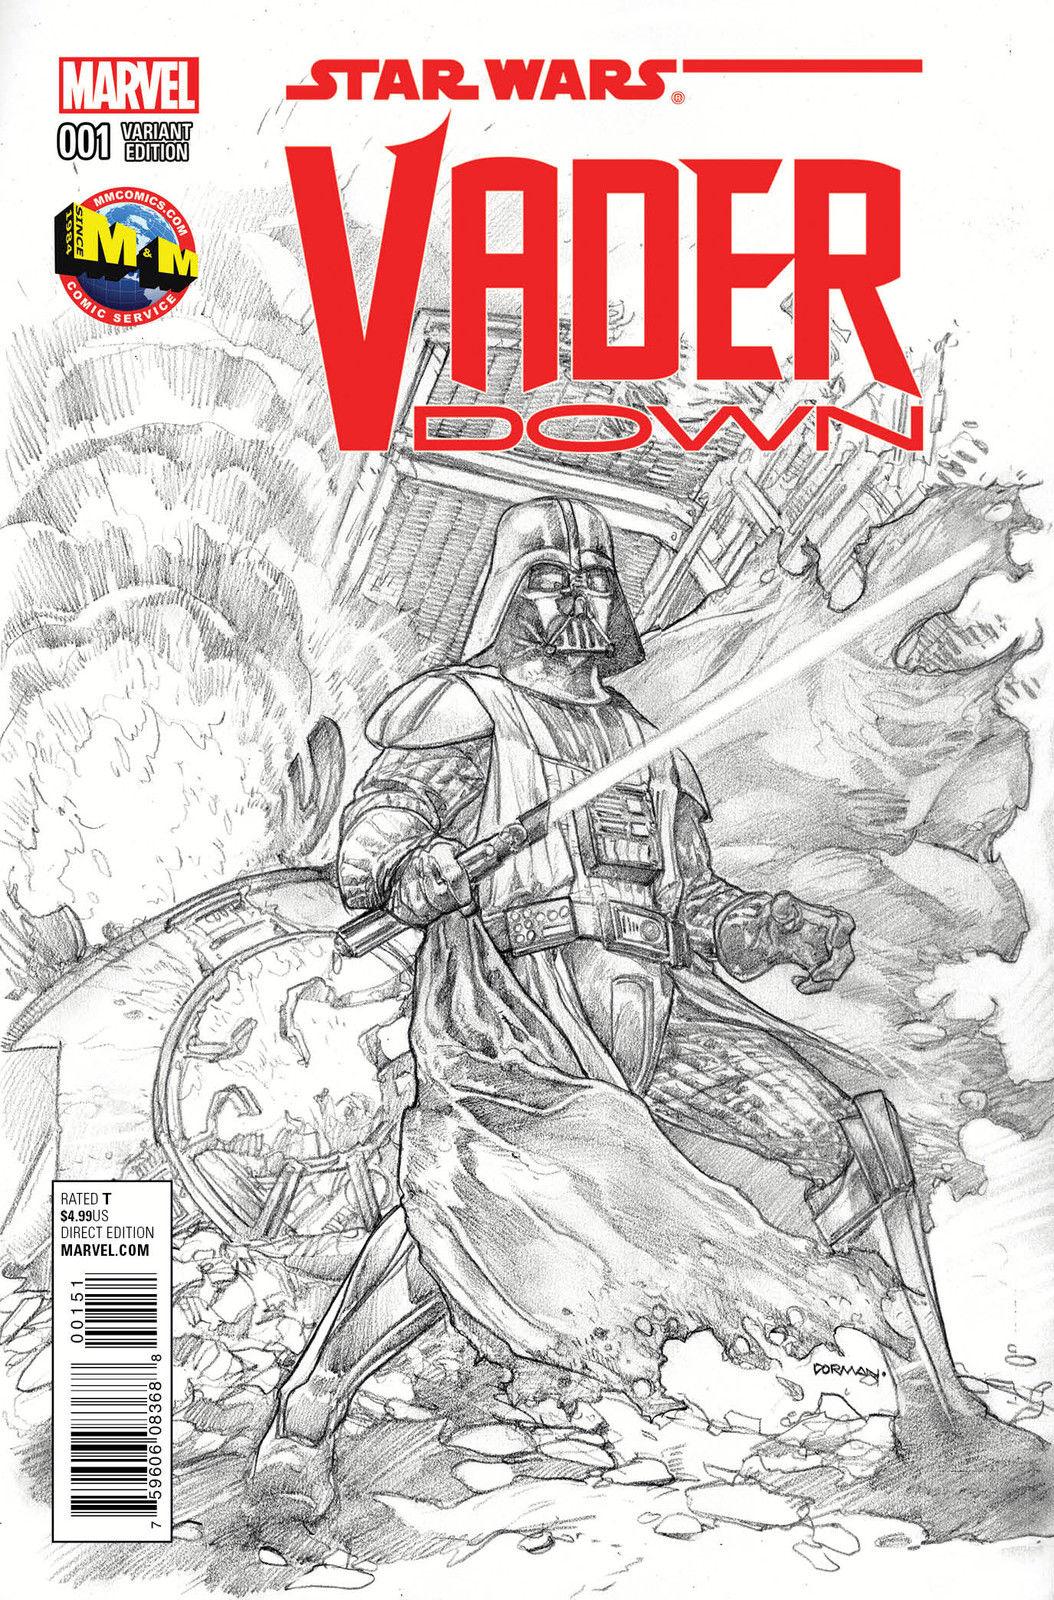 Vader Down #1 (Dave Dorman M&M Comics Sketch Variant Cover) (18.11.2015)